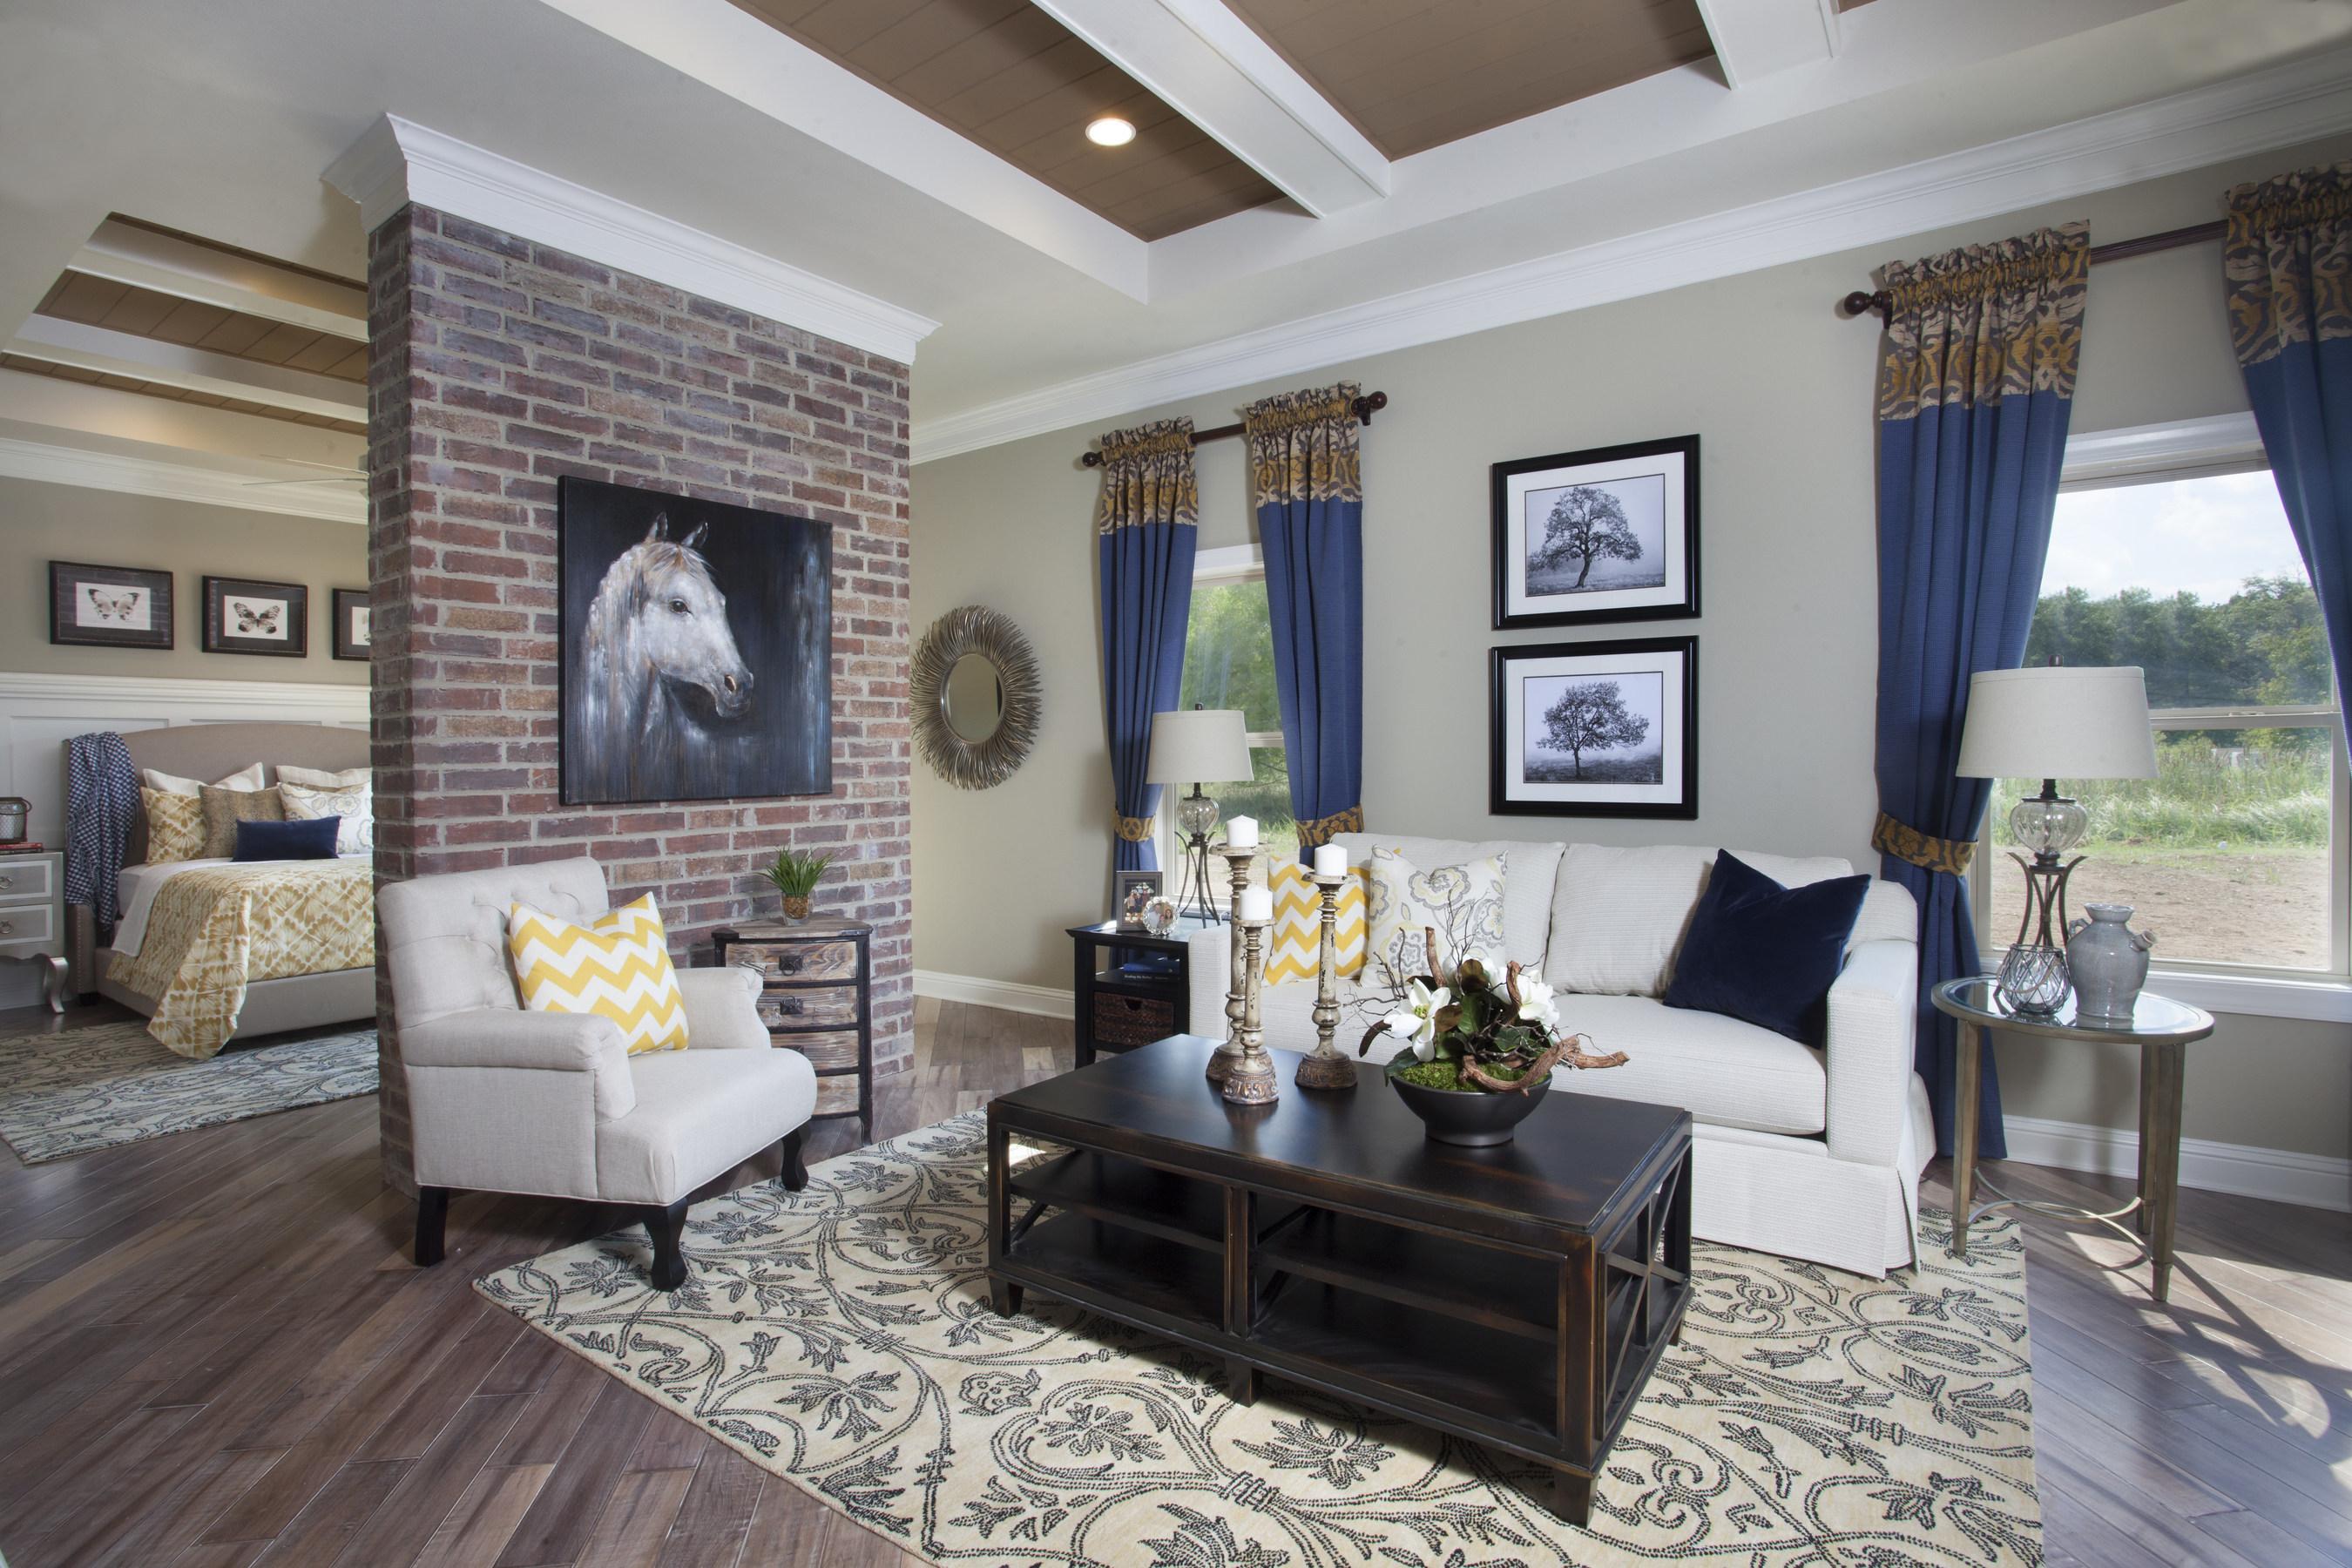 schumacher homes wins gold national award at the 2015